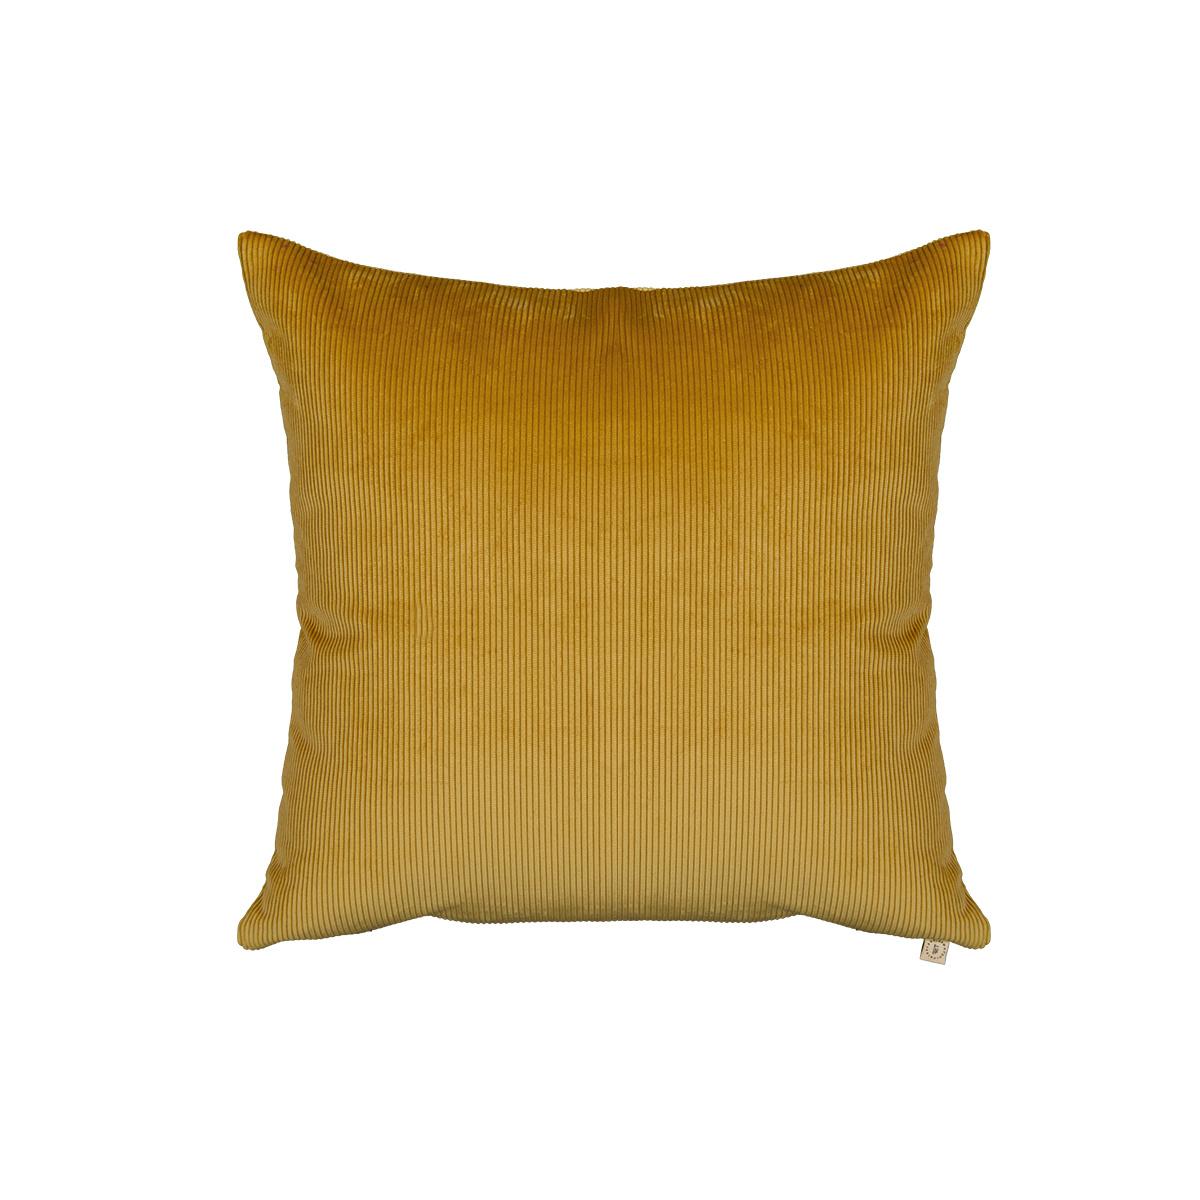 Carino mustard corduroy cushion